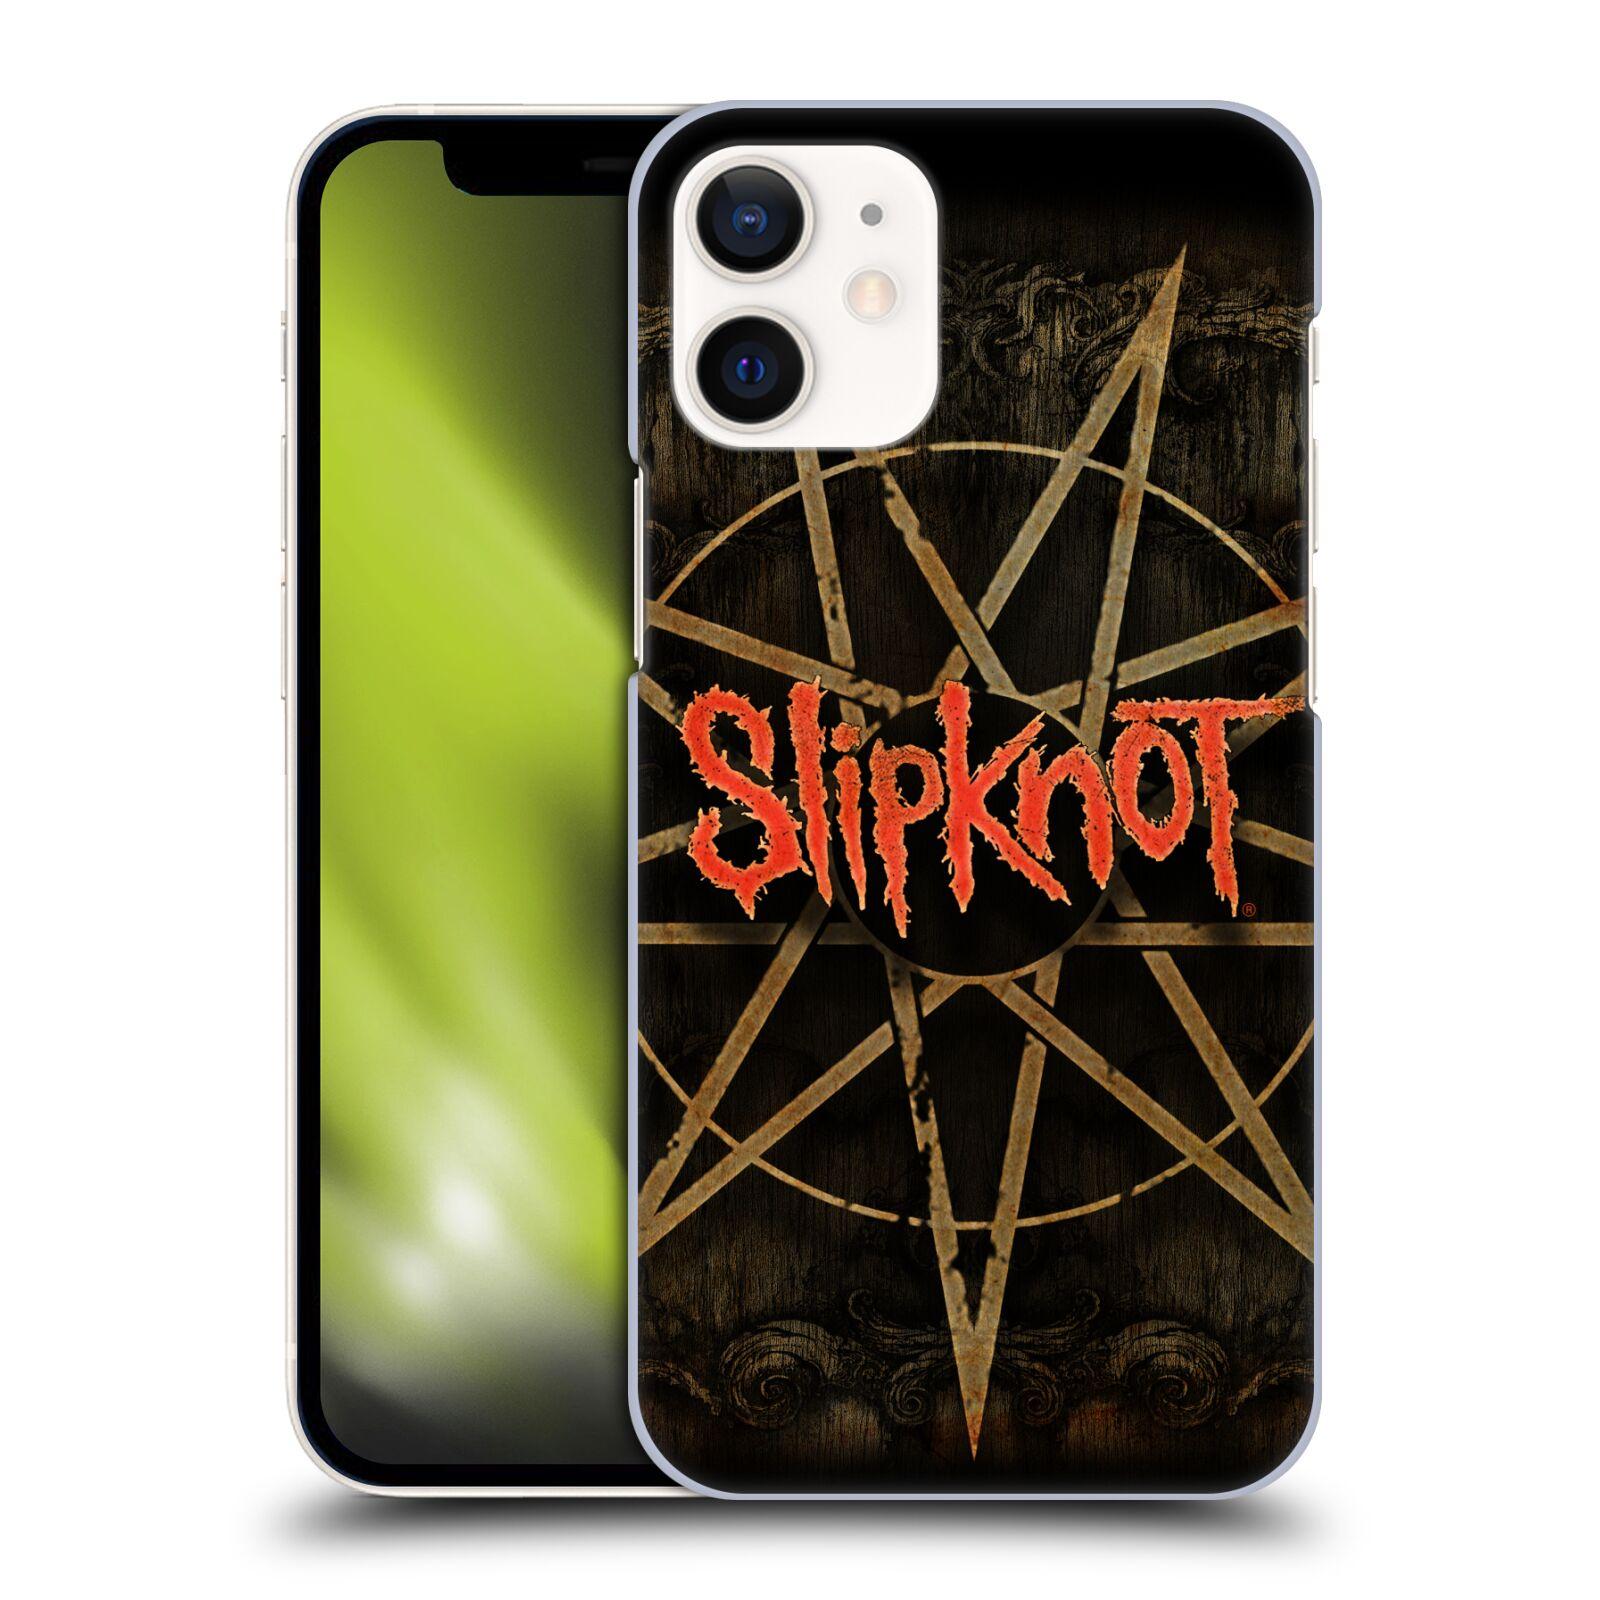 Plastové pouzdro na mobil Apple iPhone 12 Mini - Head Case - Slipknot - Znak